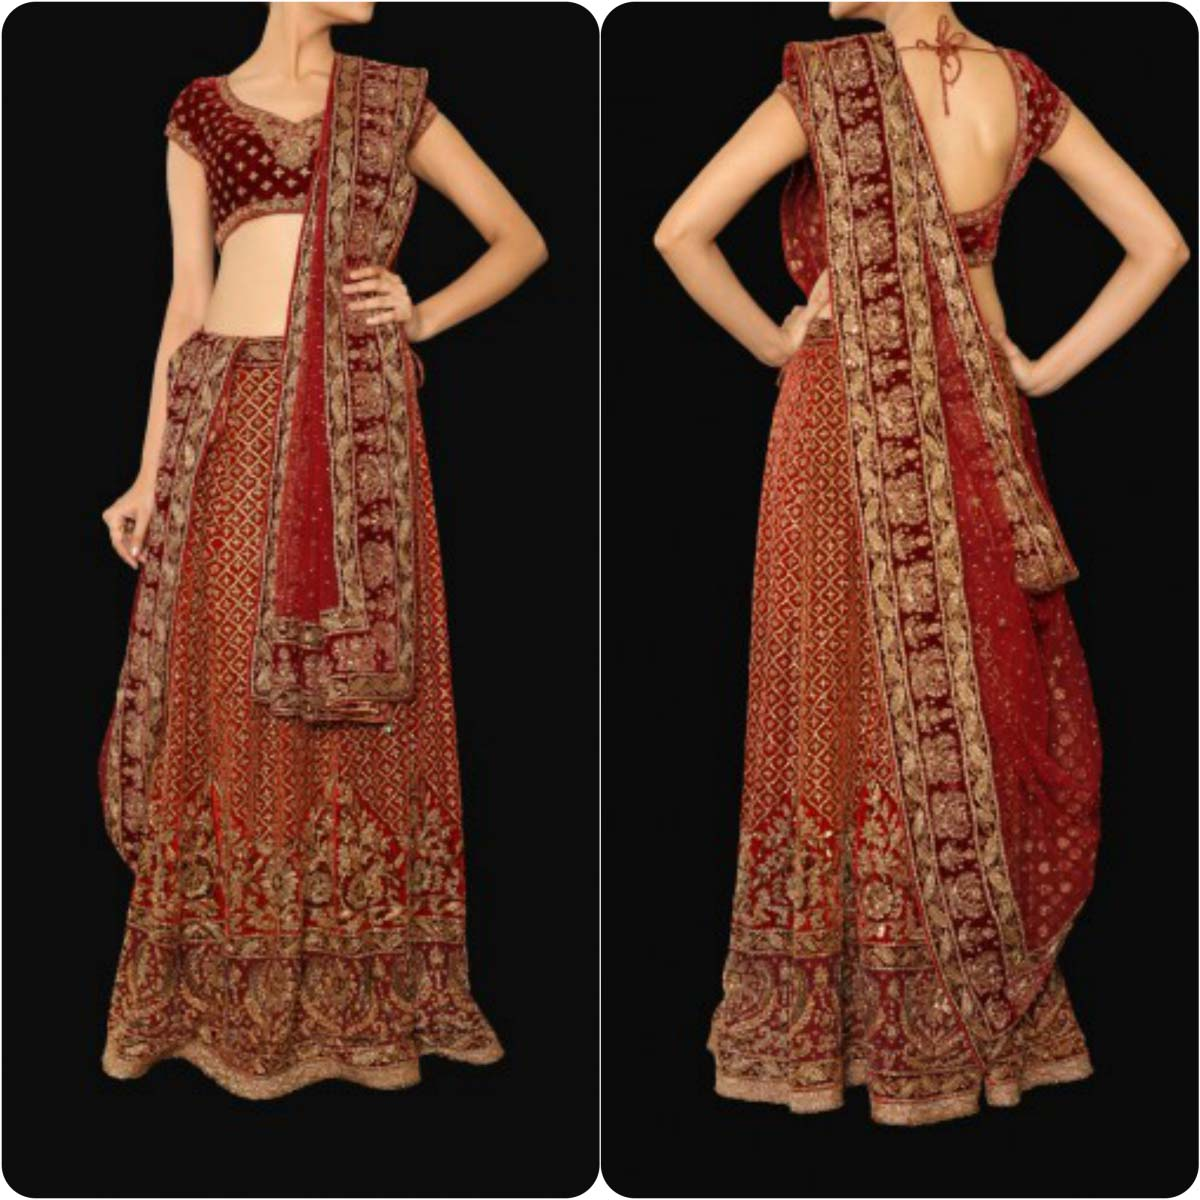 Best Indian Bridal Dresses 2017 - High Cut Wedding Dresses